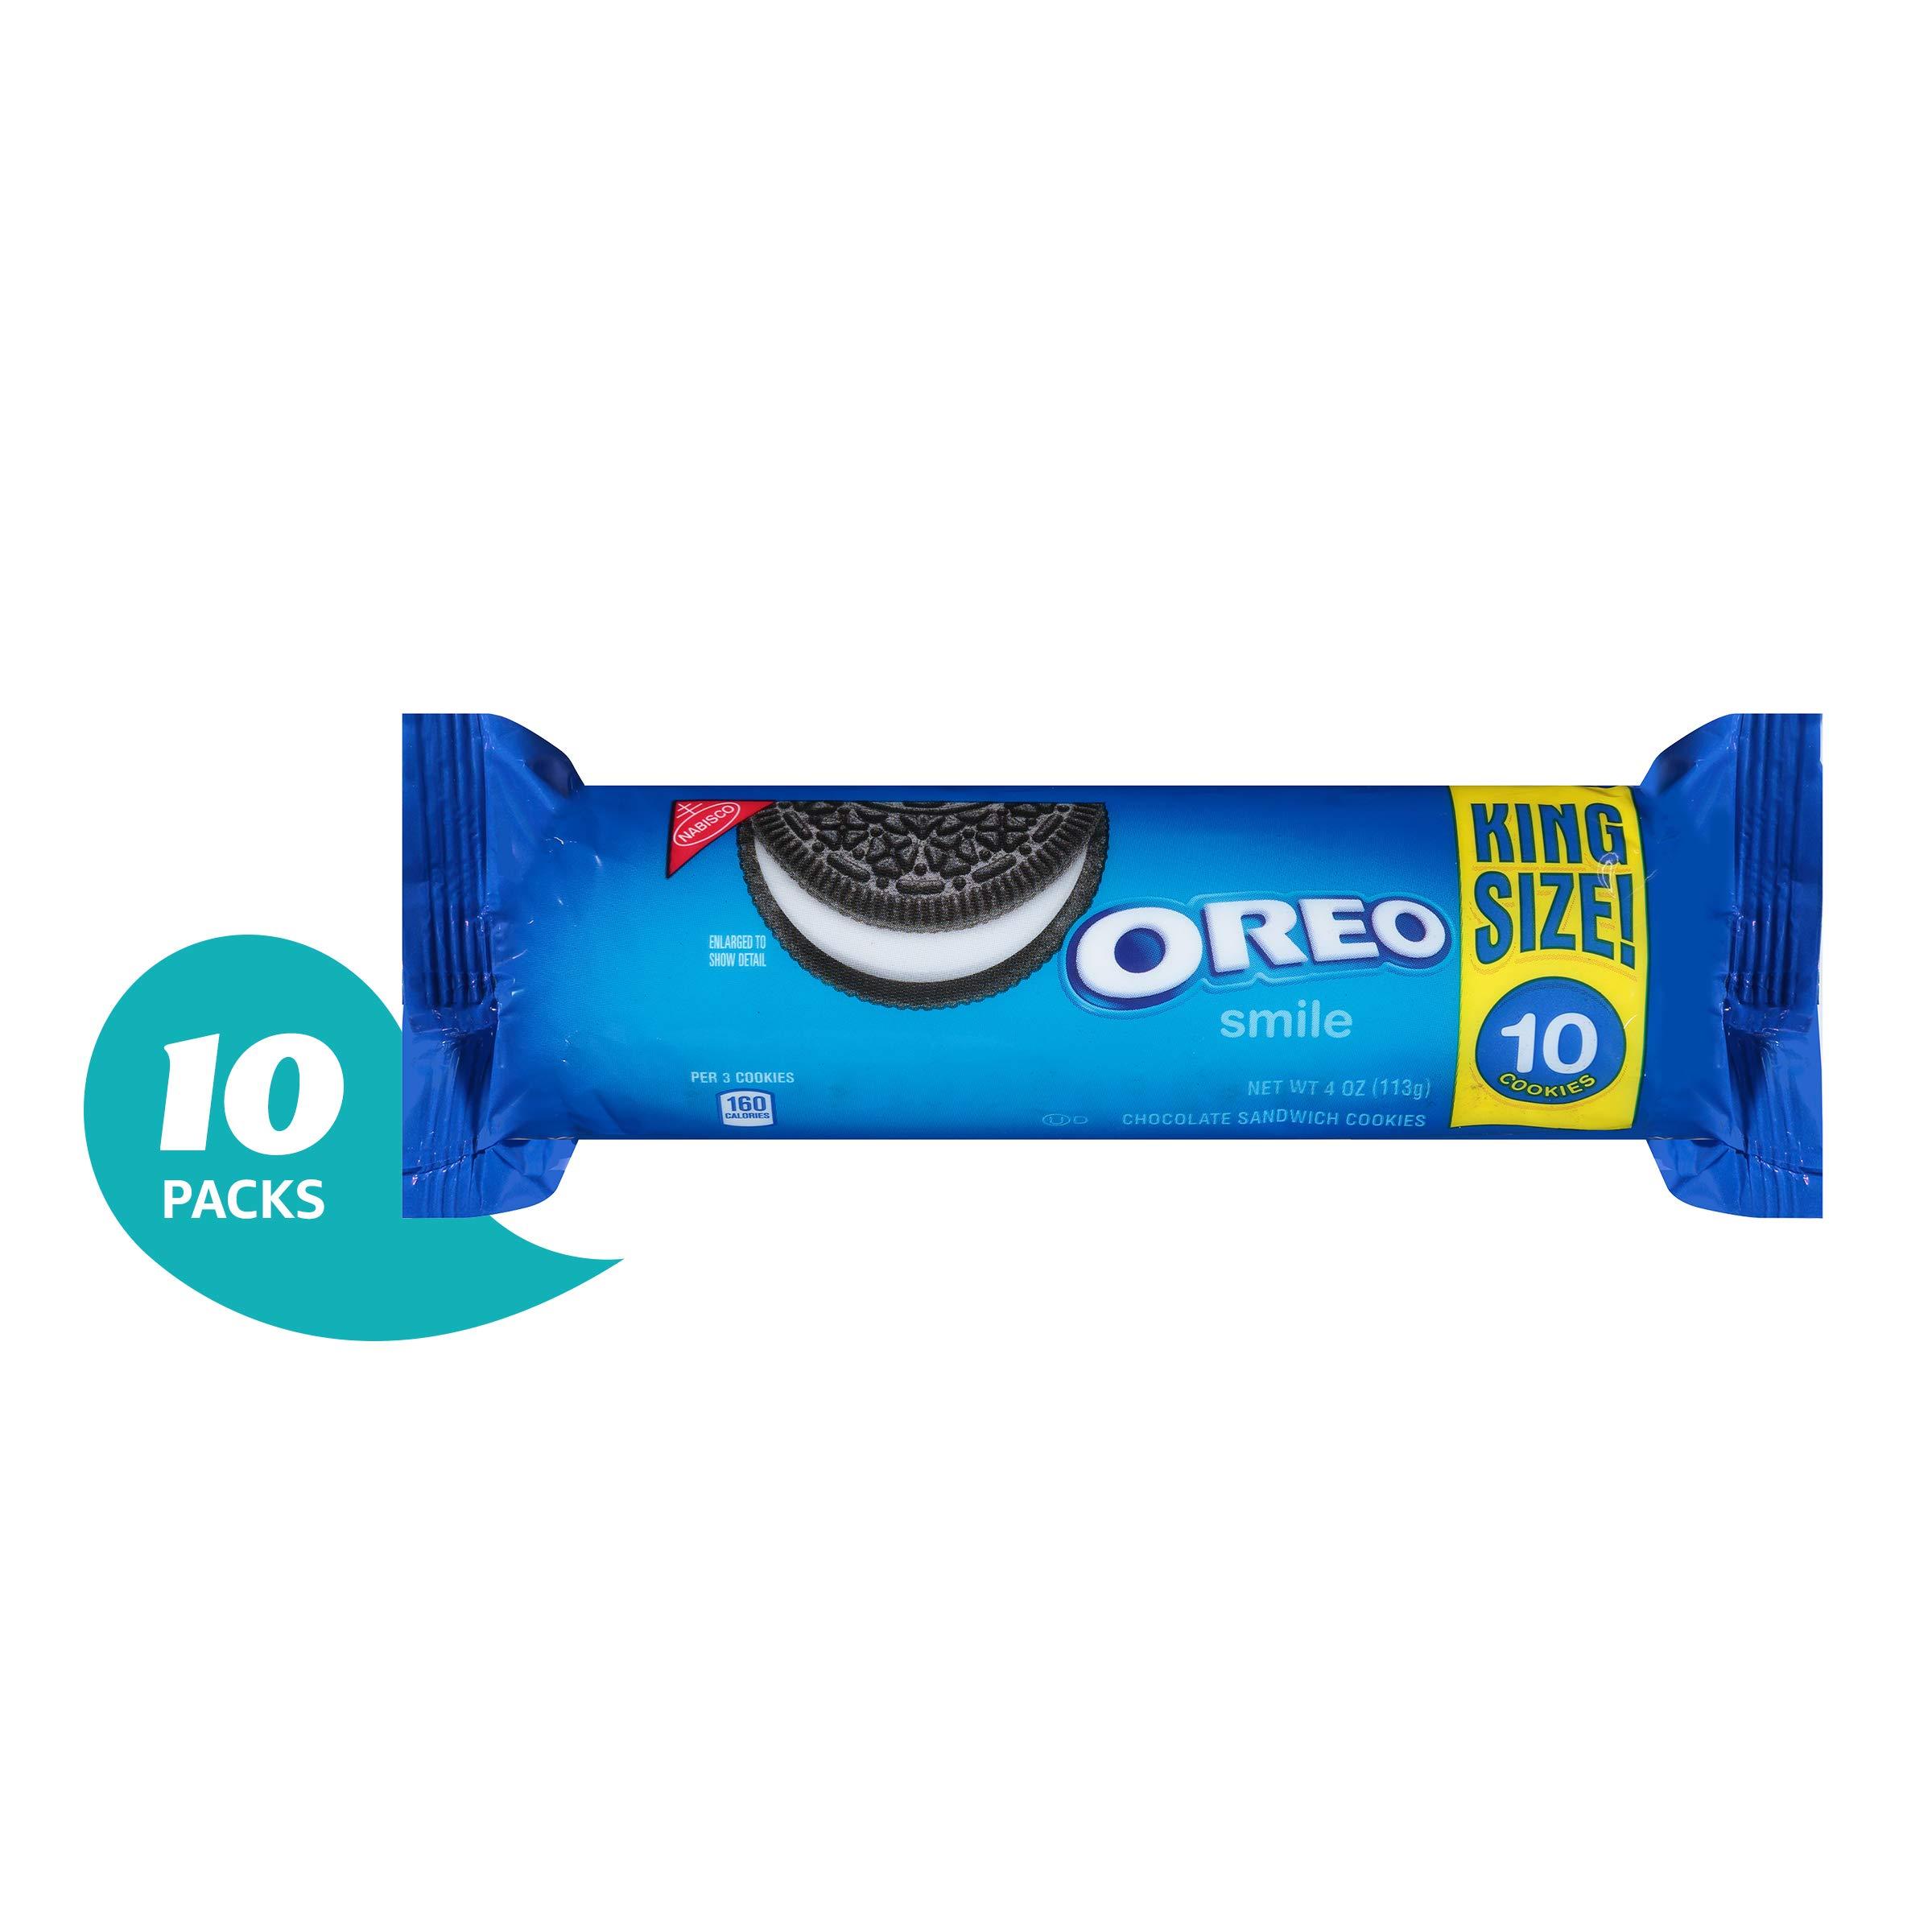 OREO Chocolate Sandwich Cookies, Original Flavor, 10 King Size Snack Packs (100 Cookies Total)